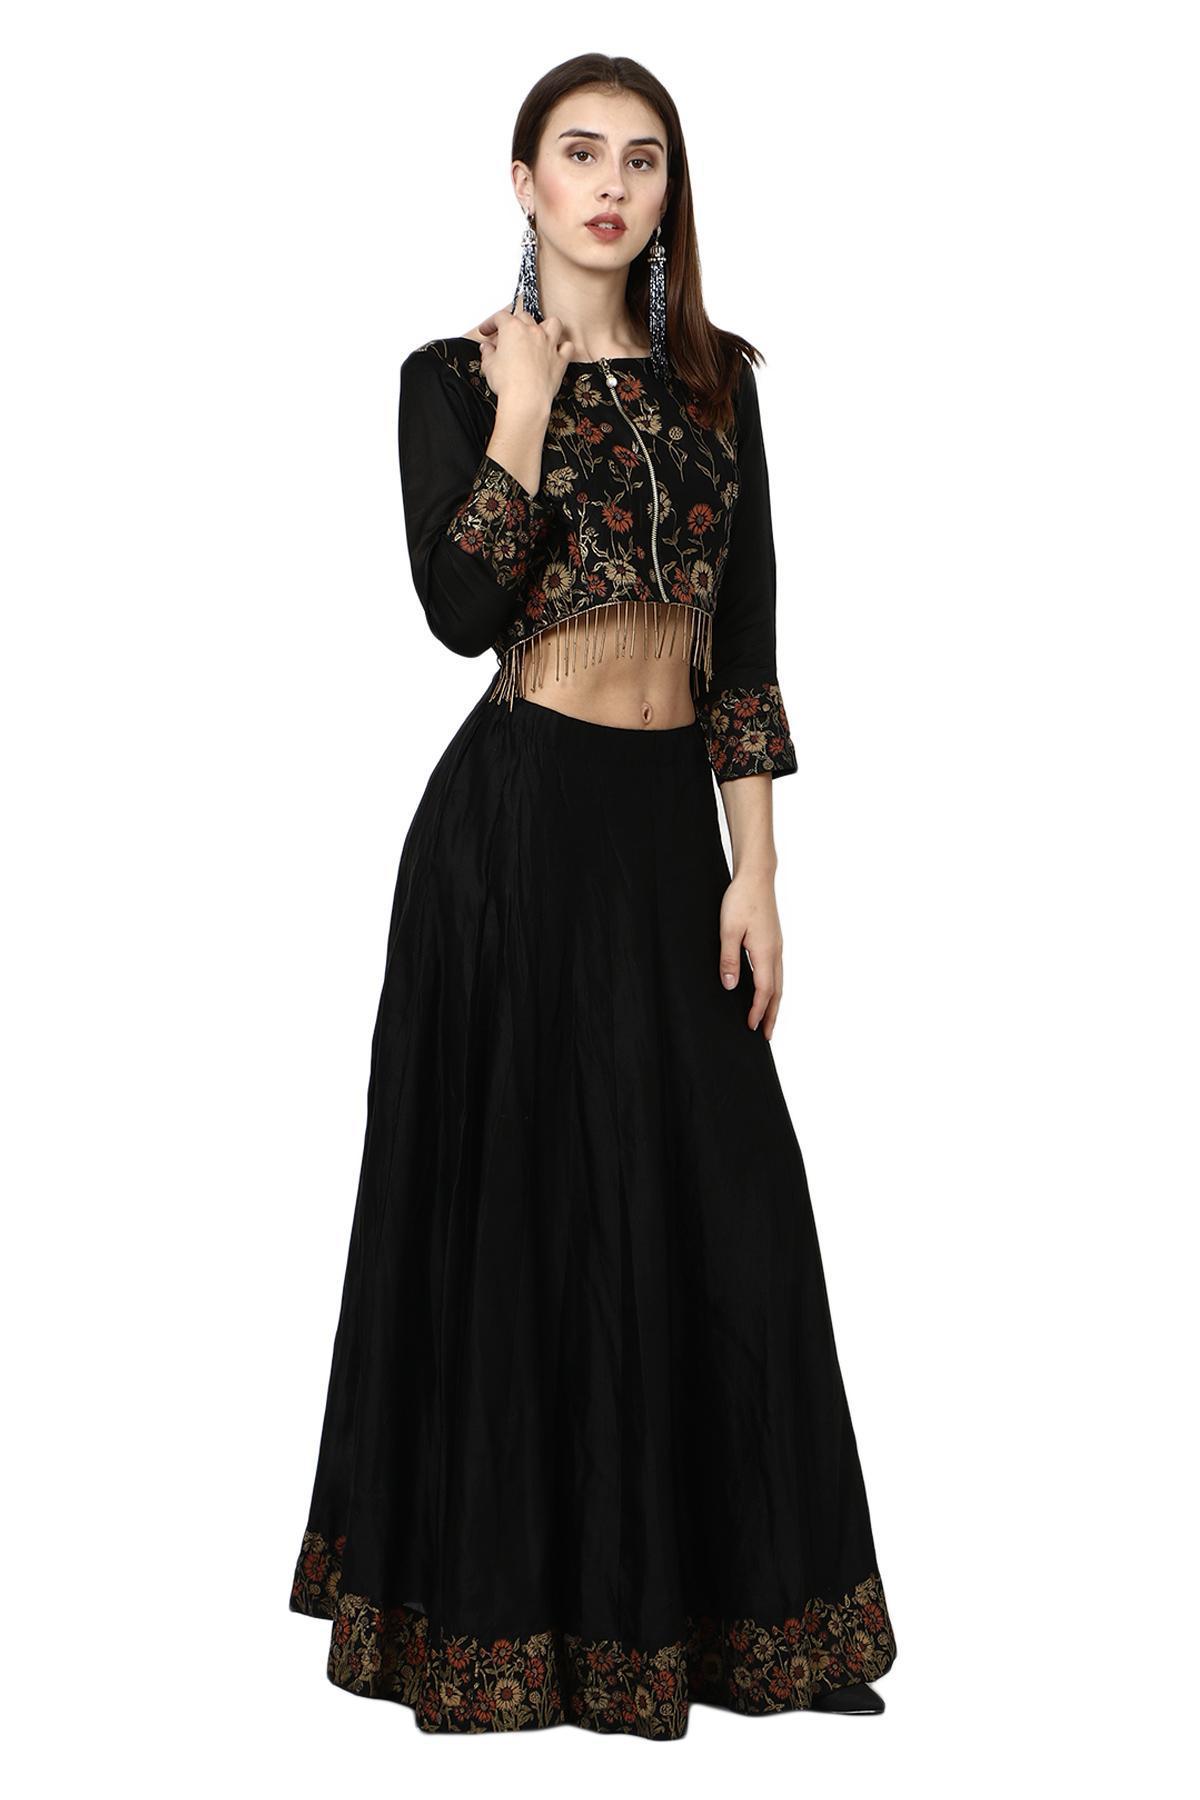 4a823f440b0254 ... Aaina by aditi ethnic Floral Print Black Crop Top Skirt Black ethnic- crop-top ...